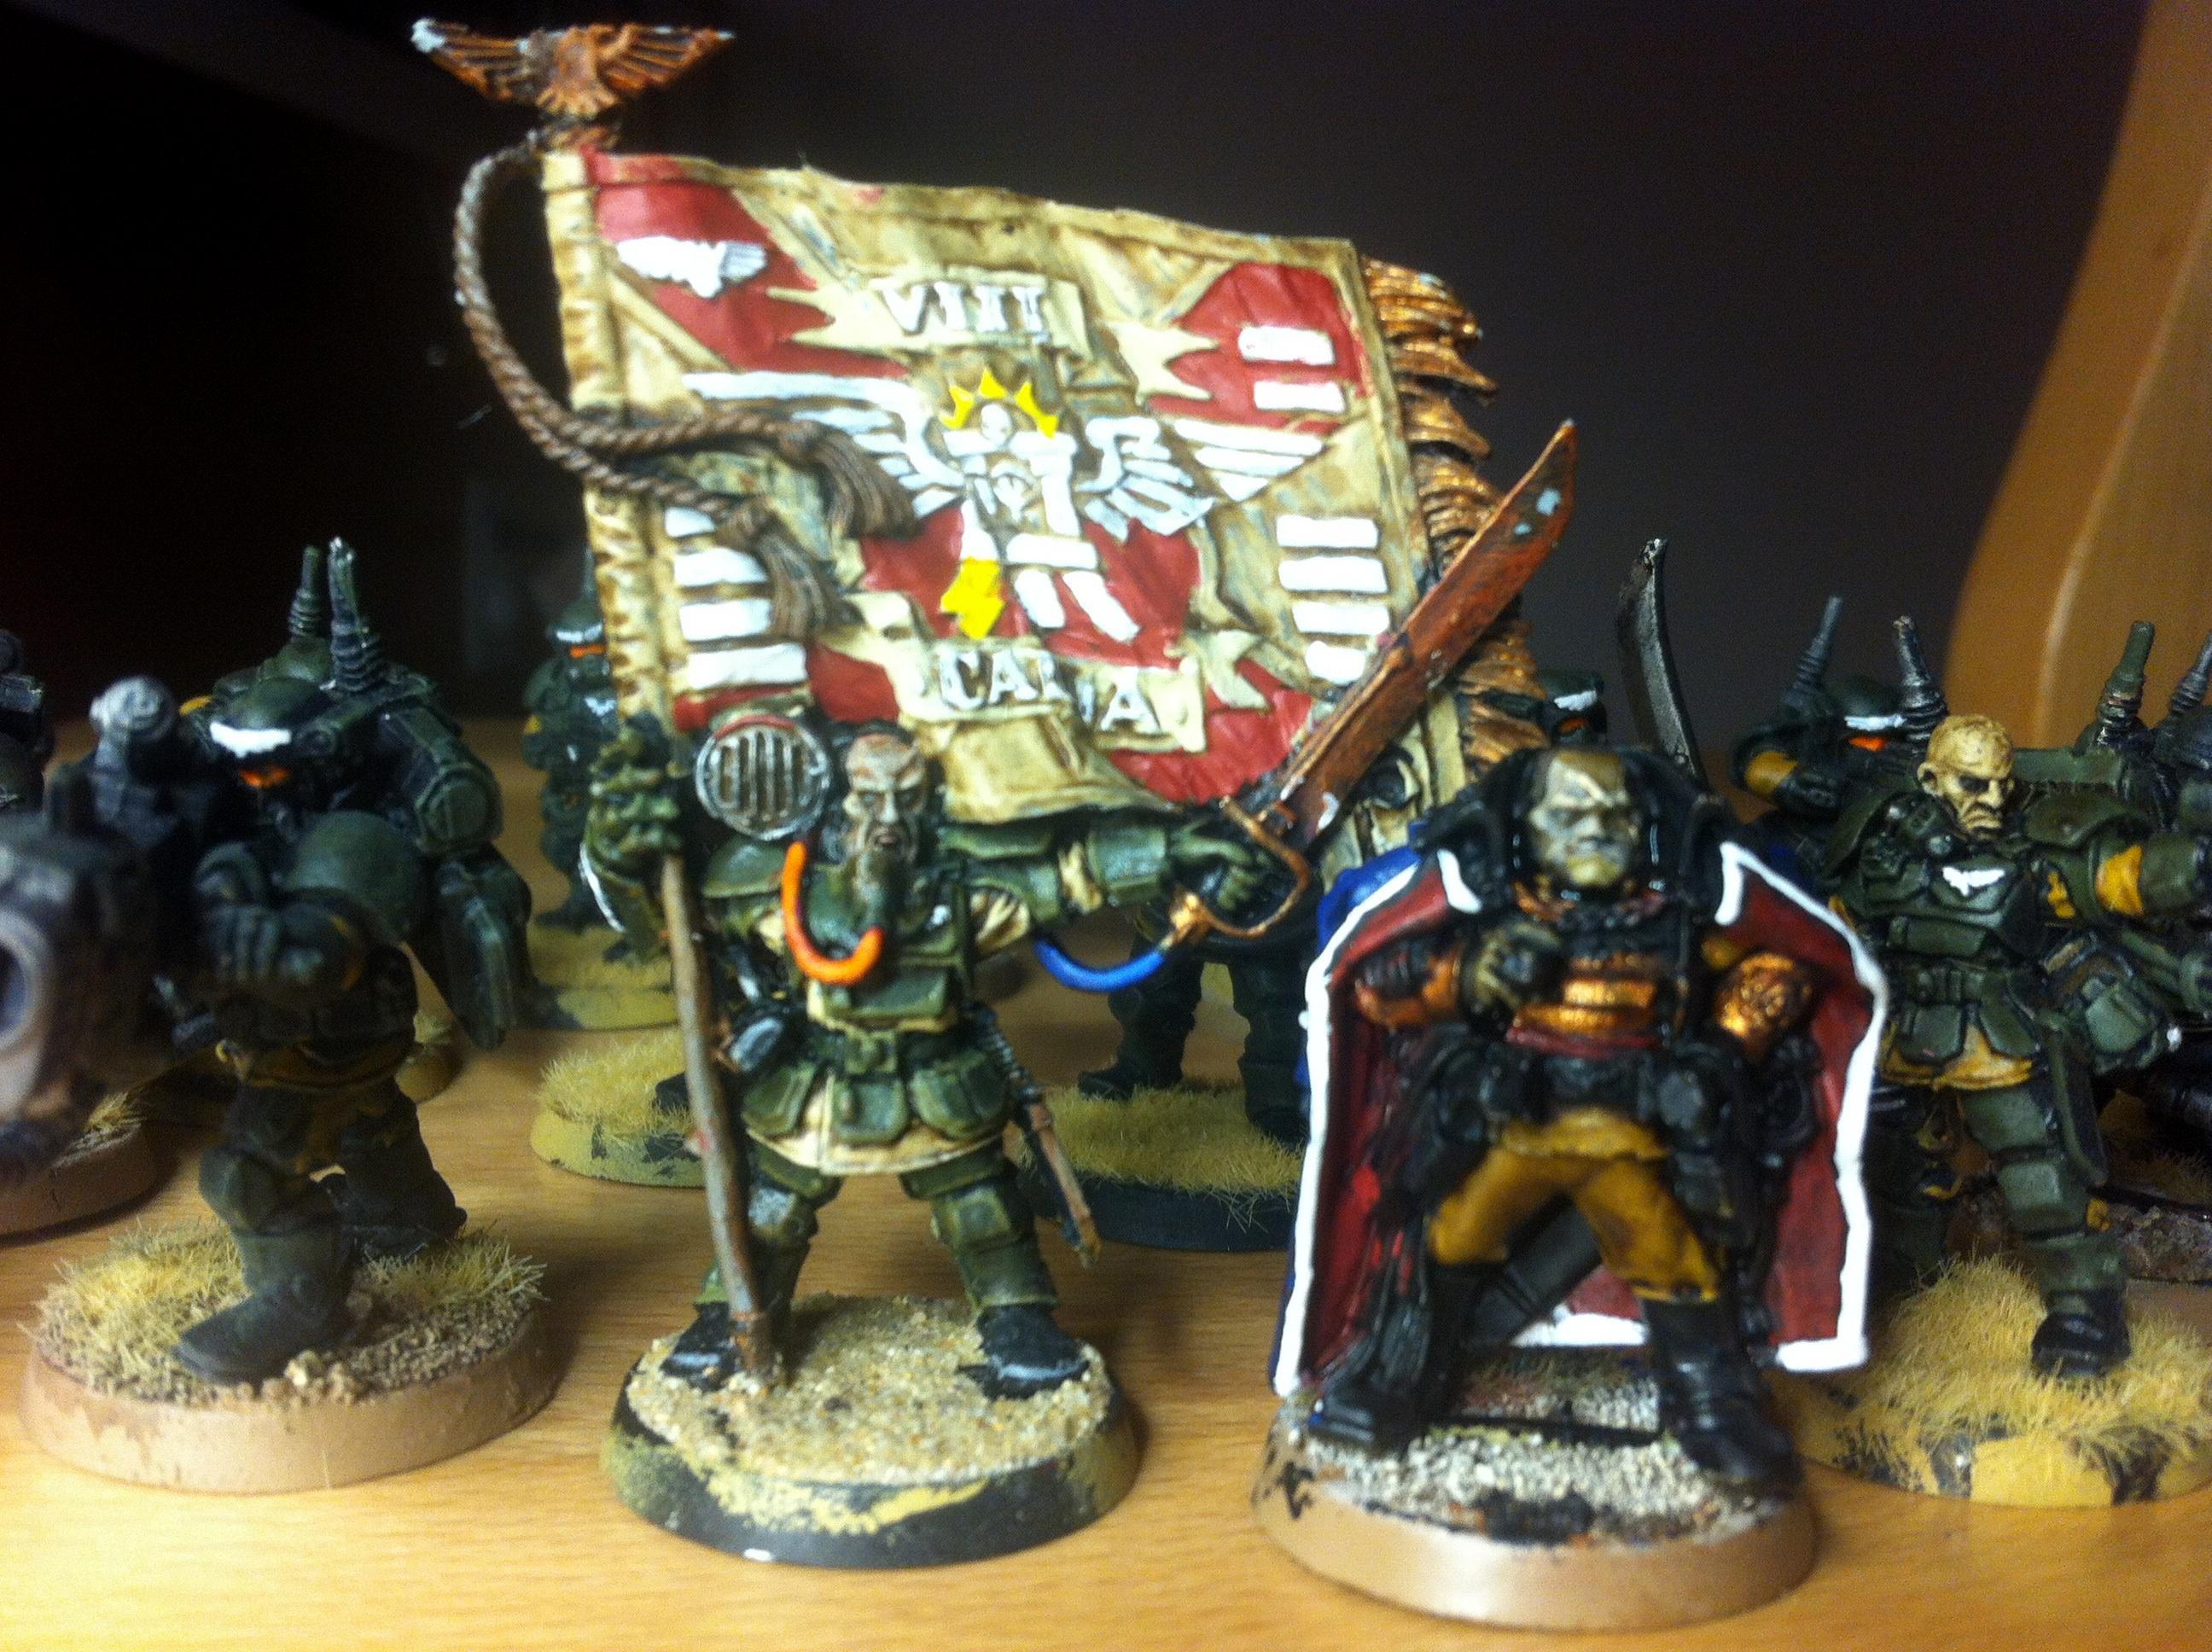 Apocalypse, Baneblade, Creed, Kasrikin Magnitzed Magnets Shadows Word Imperial Guard Ig, Kell